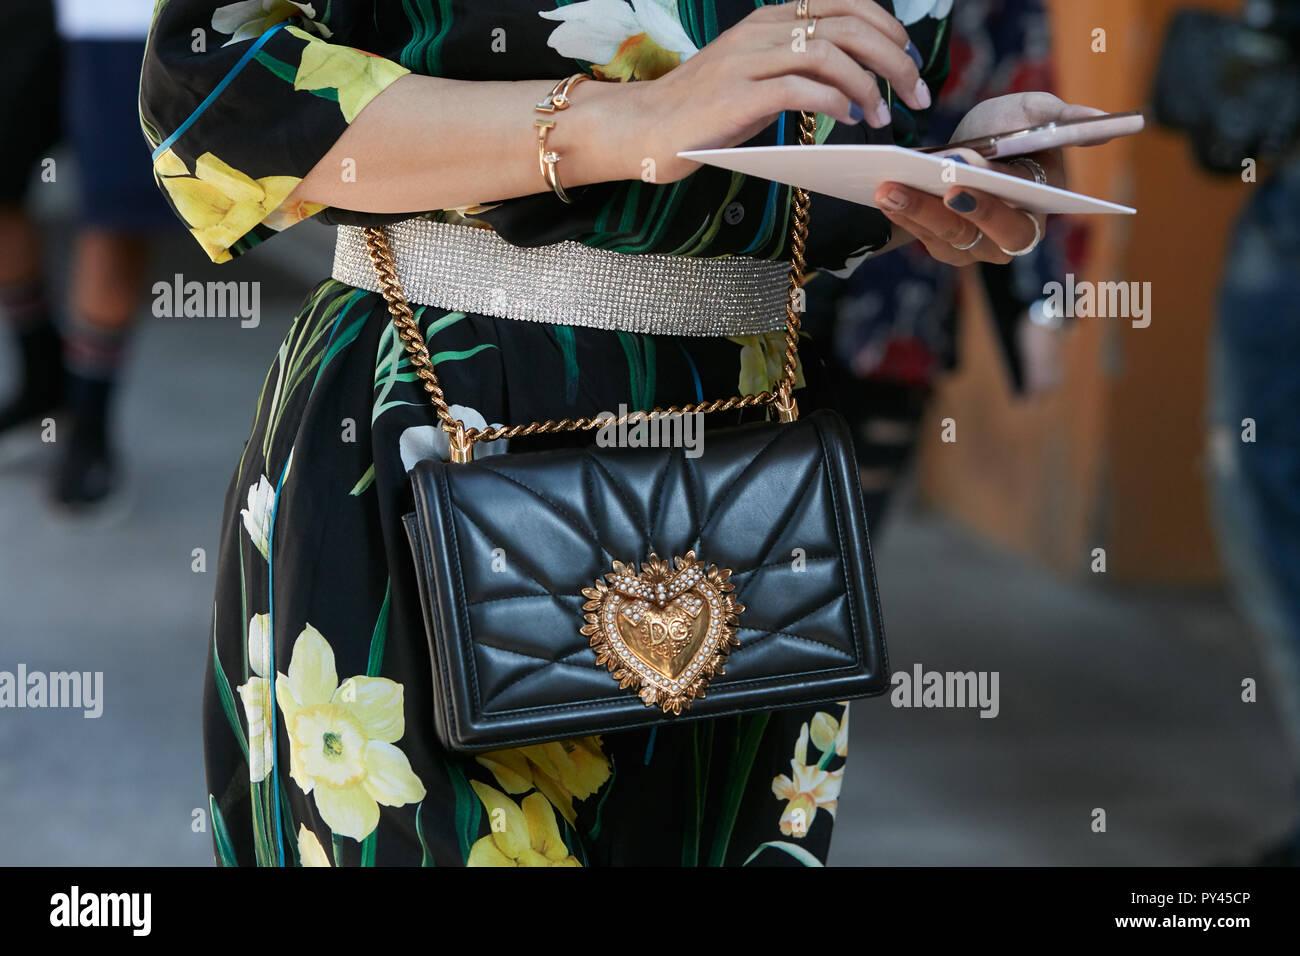 Gold Chain Belt Immagini   Gold Chain Belt Fotos Stock - Alamy 86188d52446f